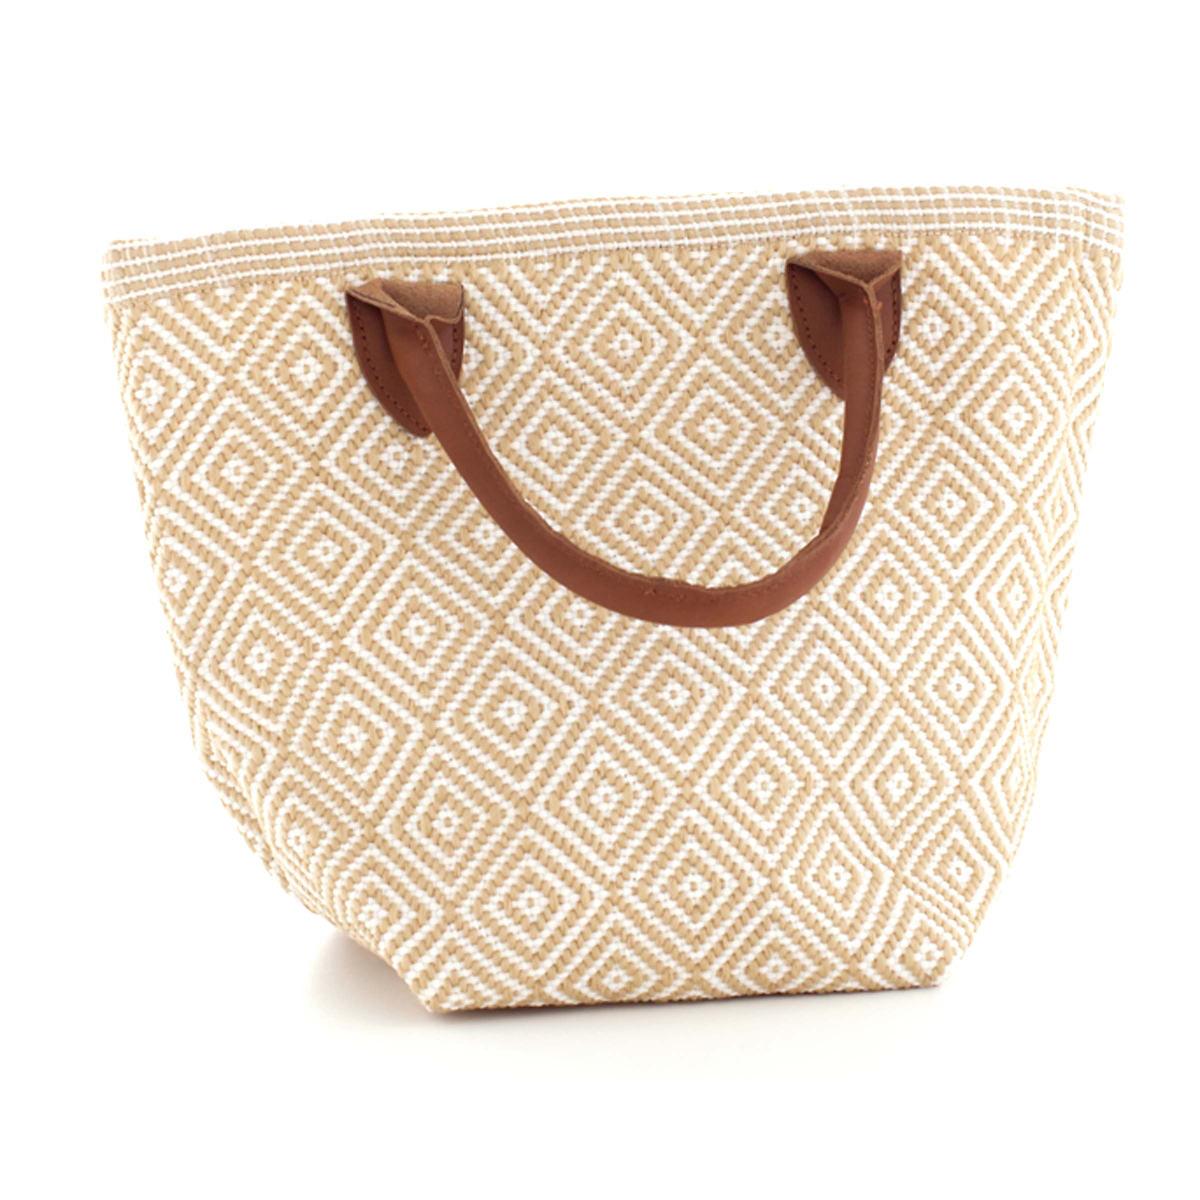 Fresh American Le Tote Wheat/White Tote Bag Petit